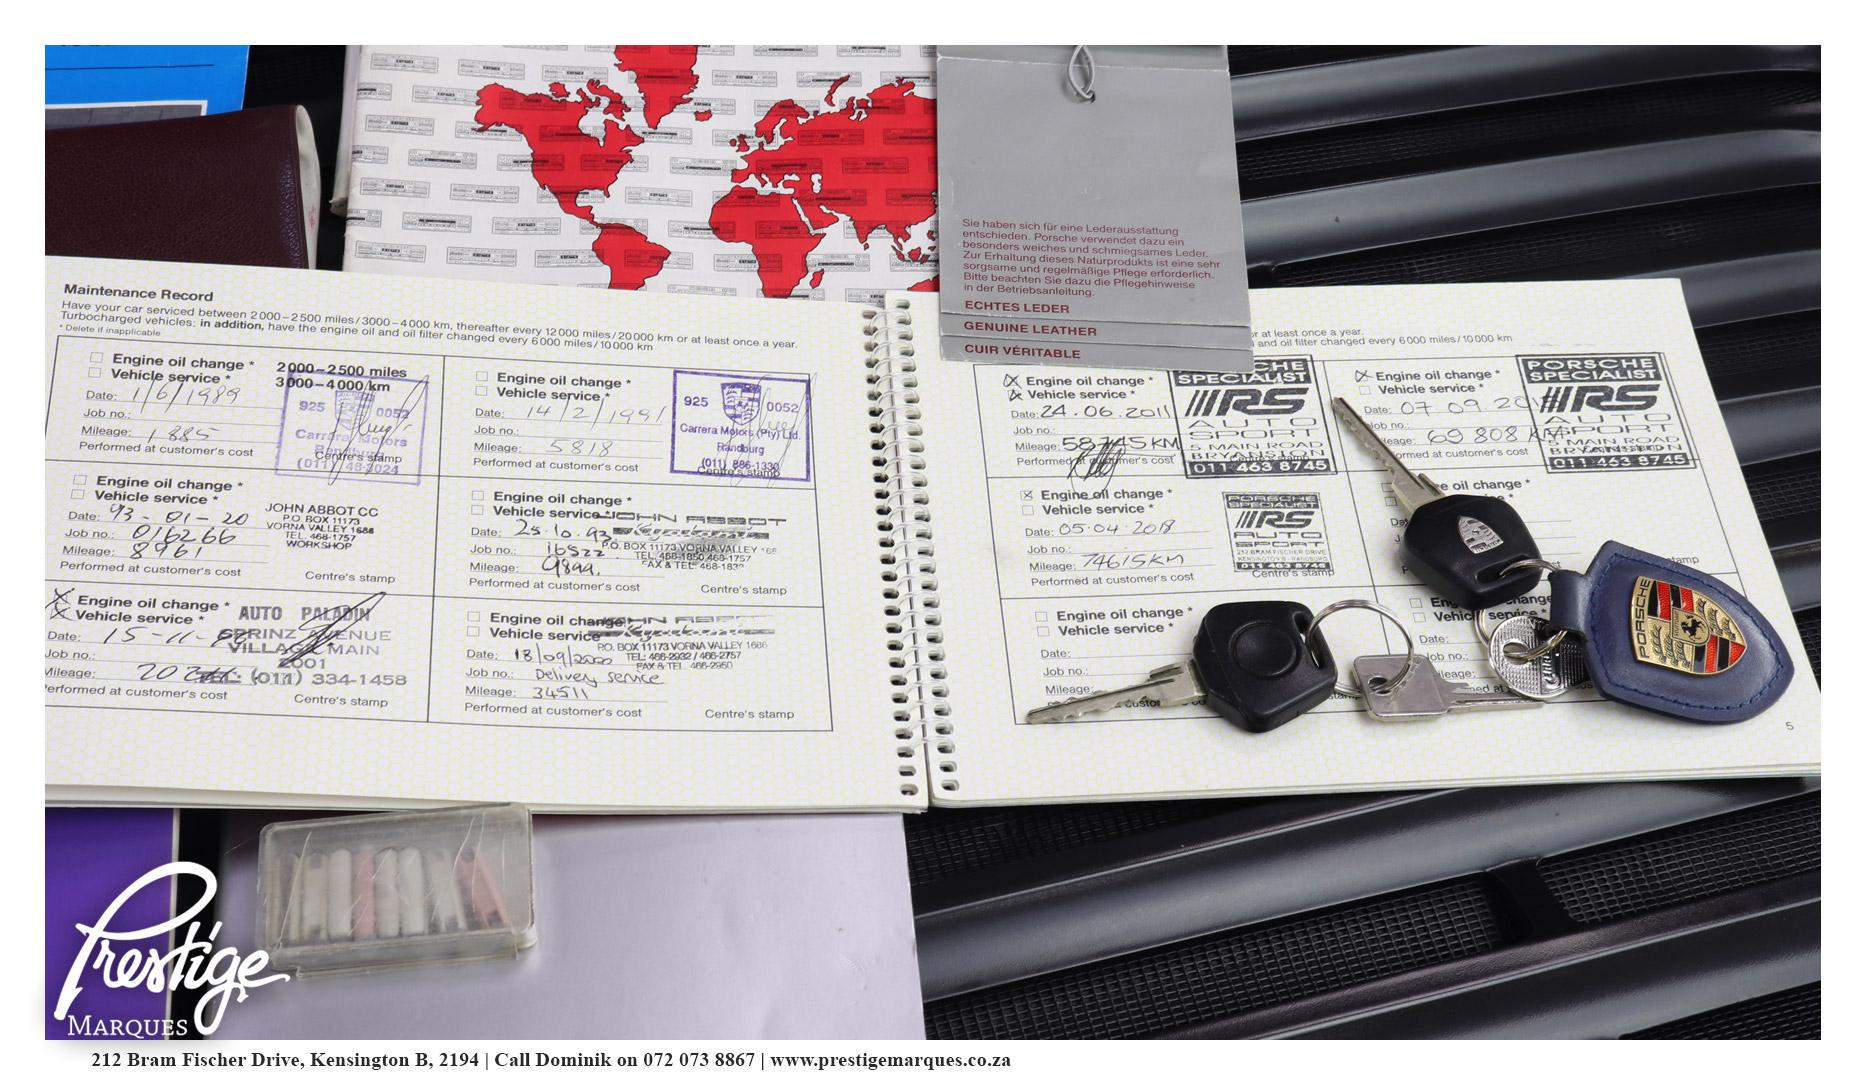 1989-Porsche-911-Carerra-3.2-350-Prestige-Marques-Randburg-Sandton-17